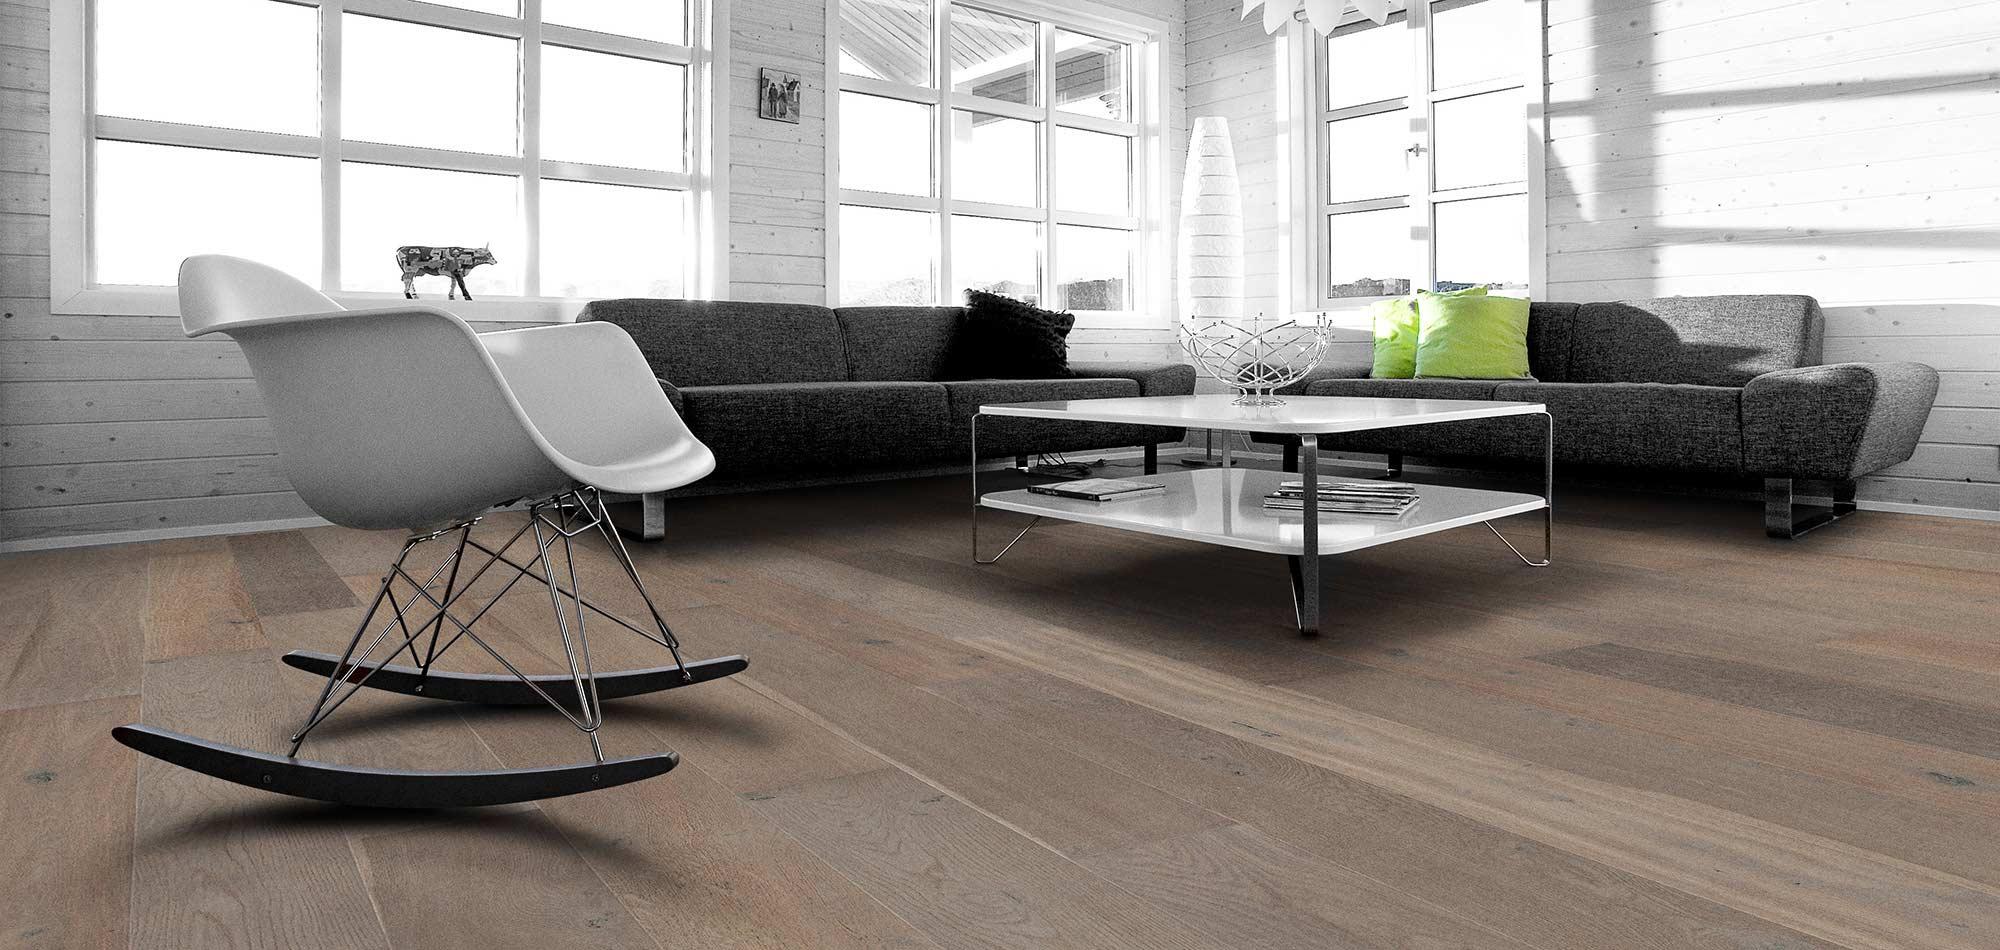 carpet hermeymonica l flooring list modern lasting long popular floors